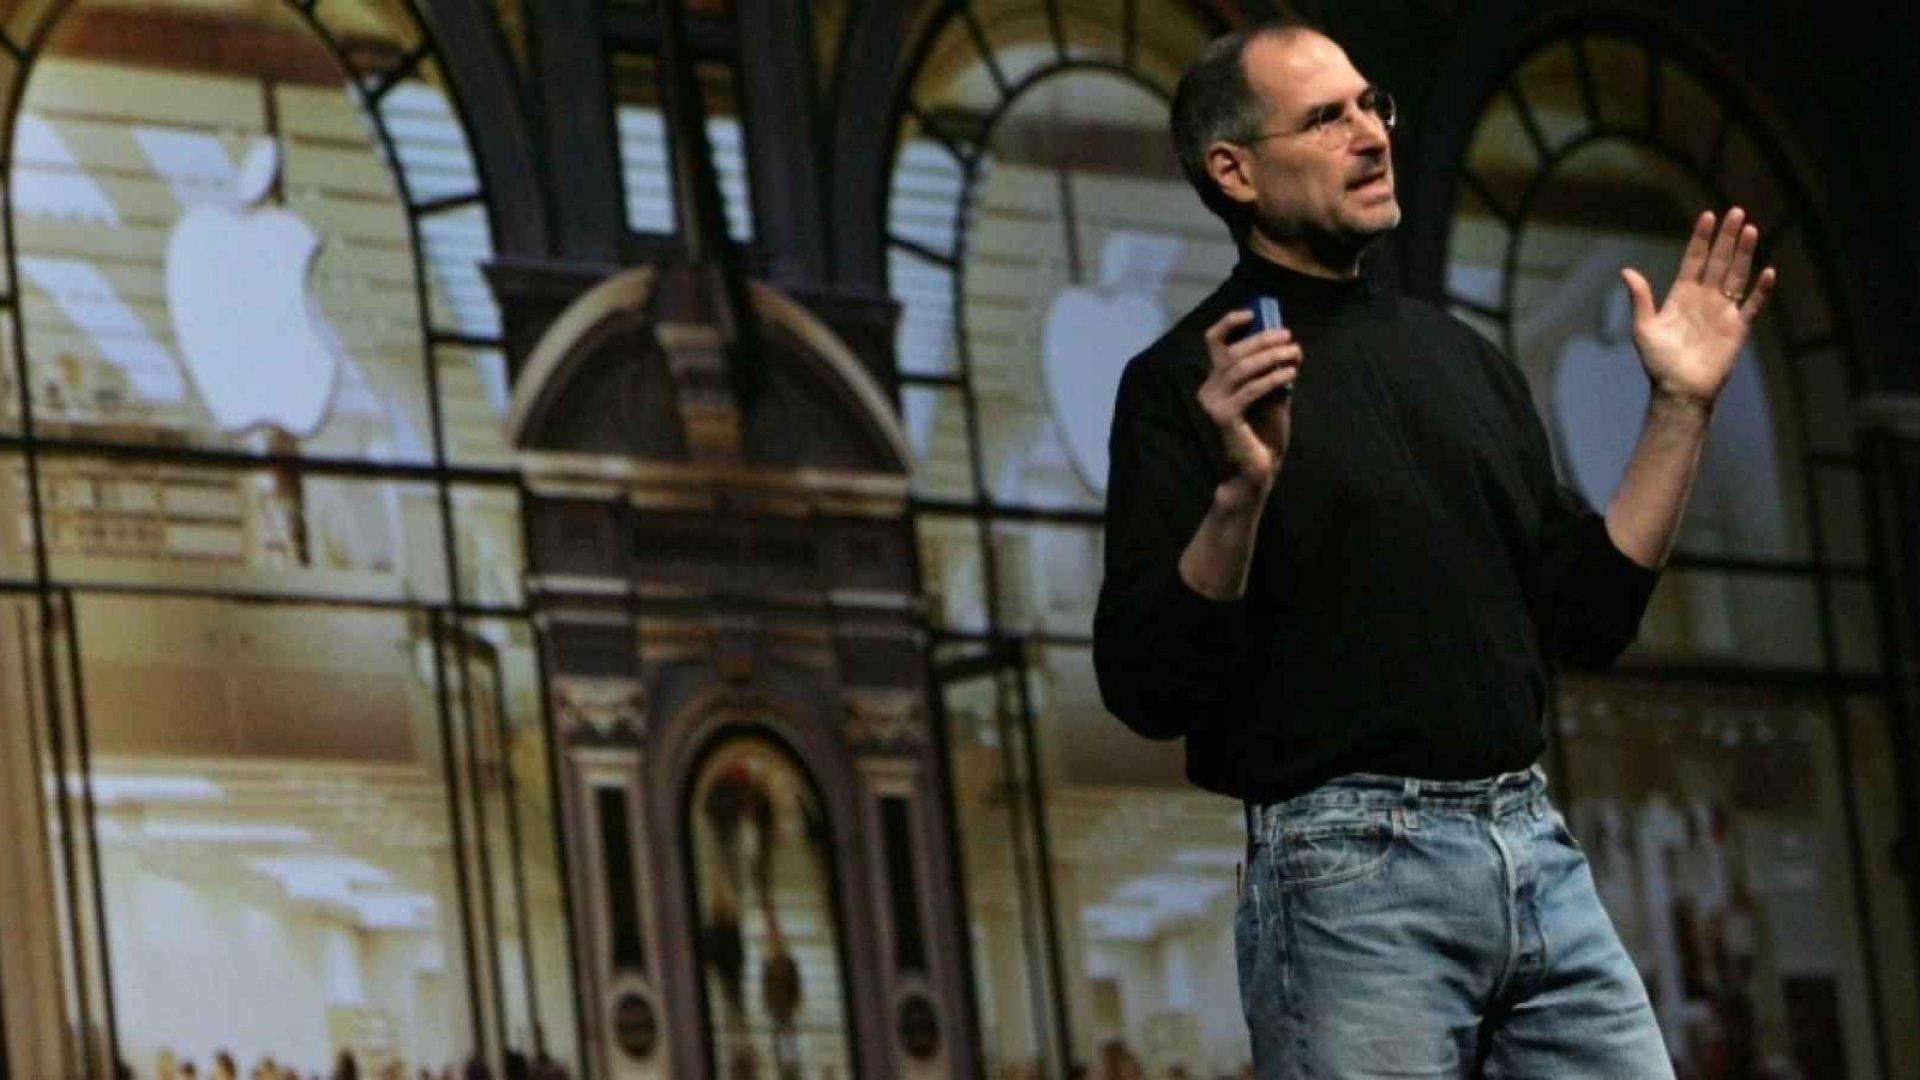 Here's Why Steve Jobs' Dress Code Mattered